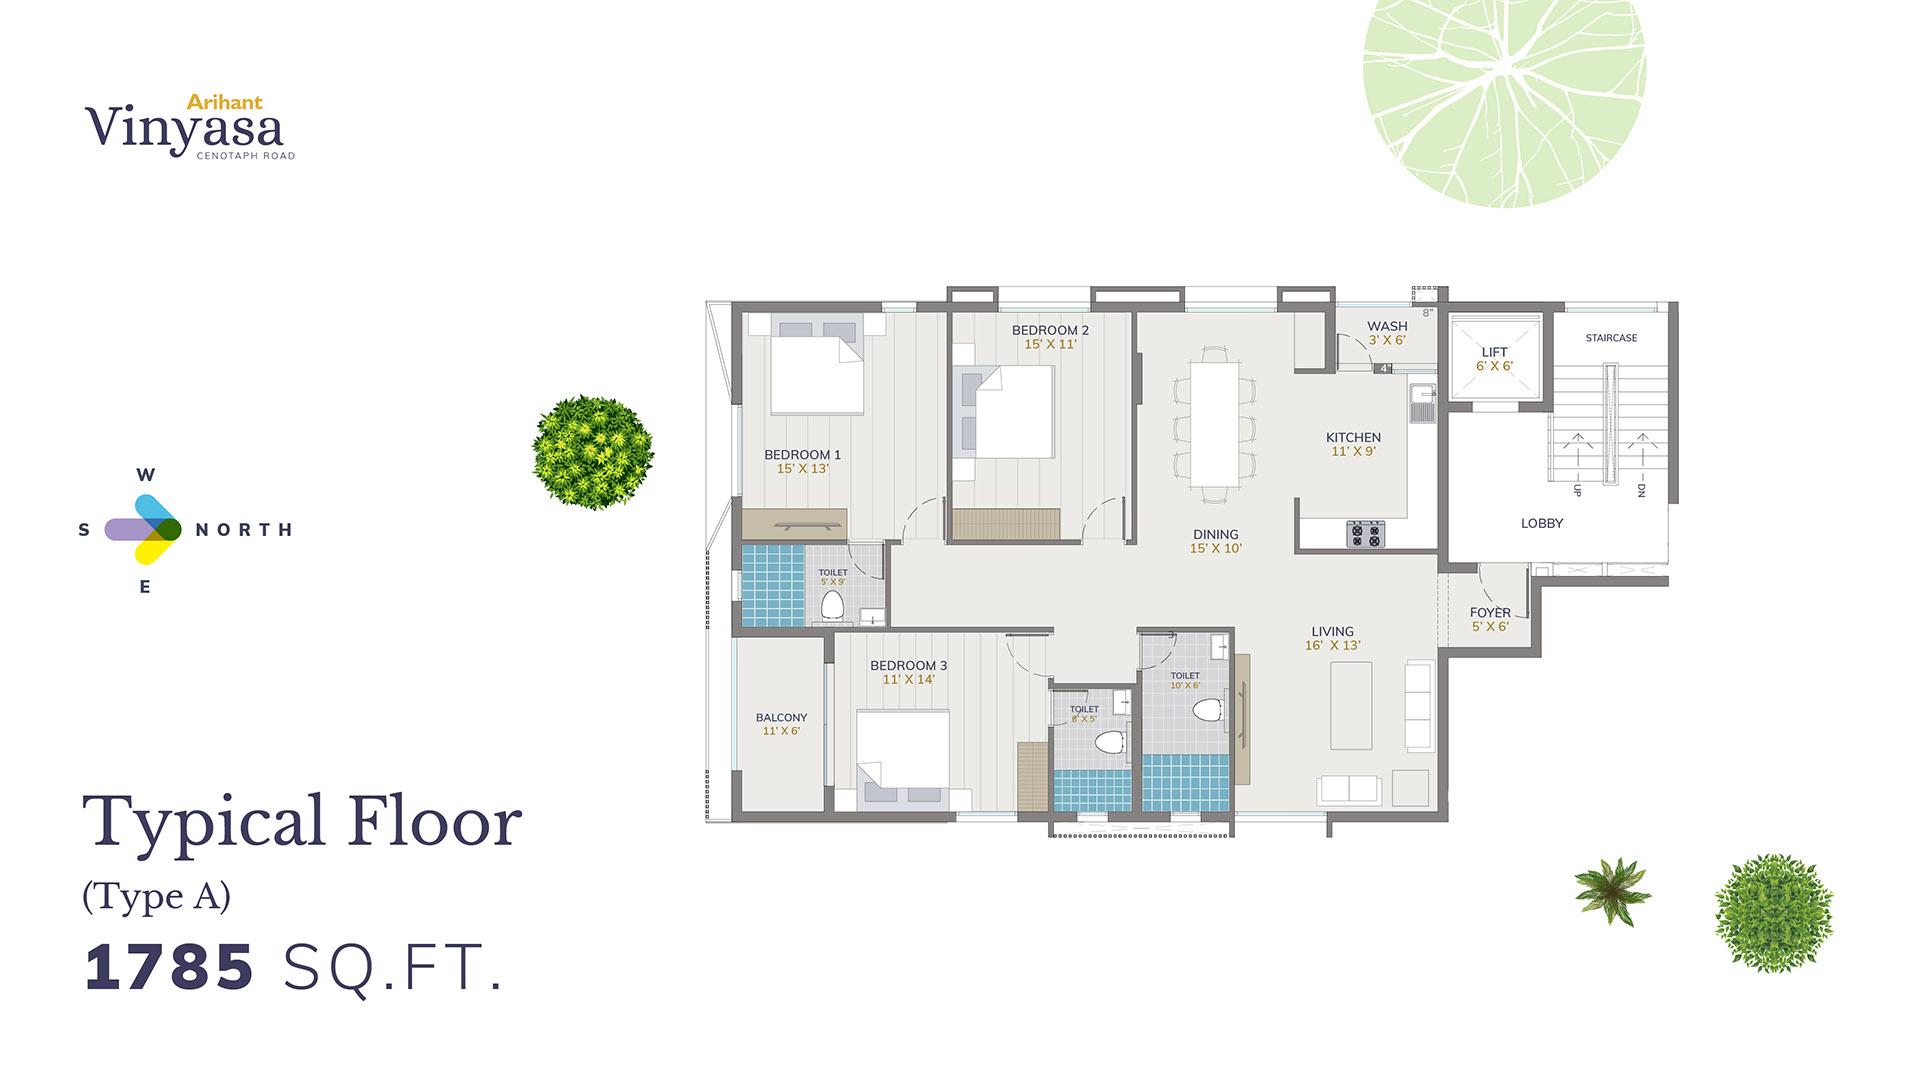 Vinyasa Typical Floor